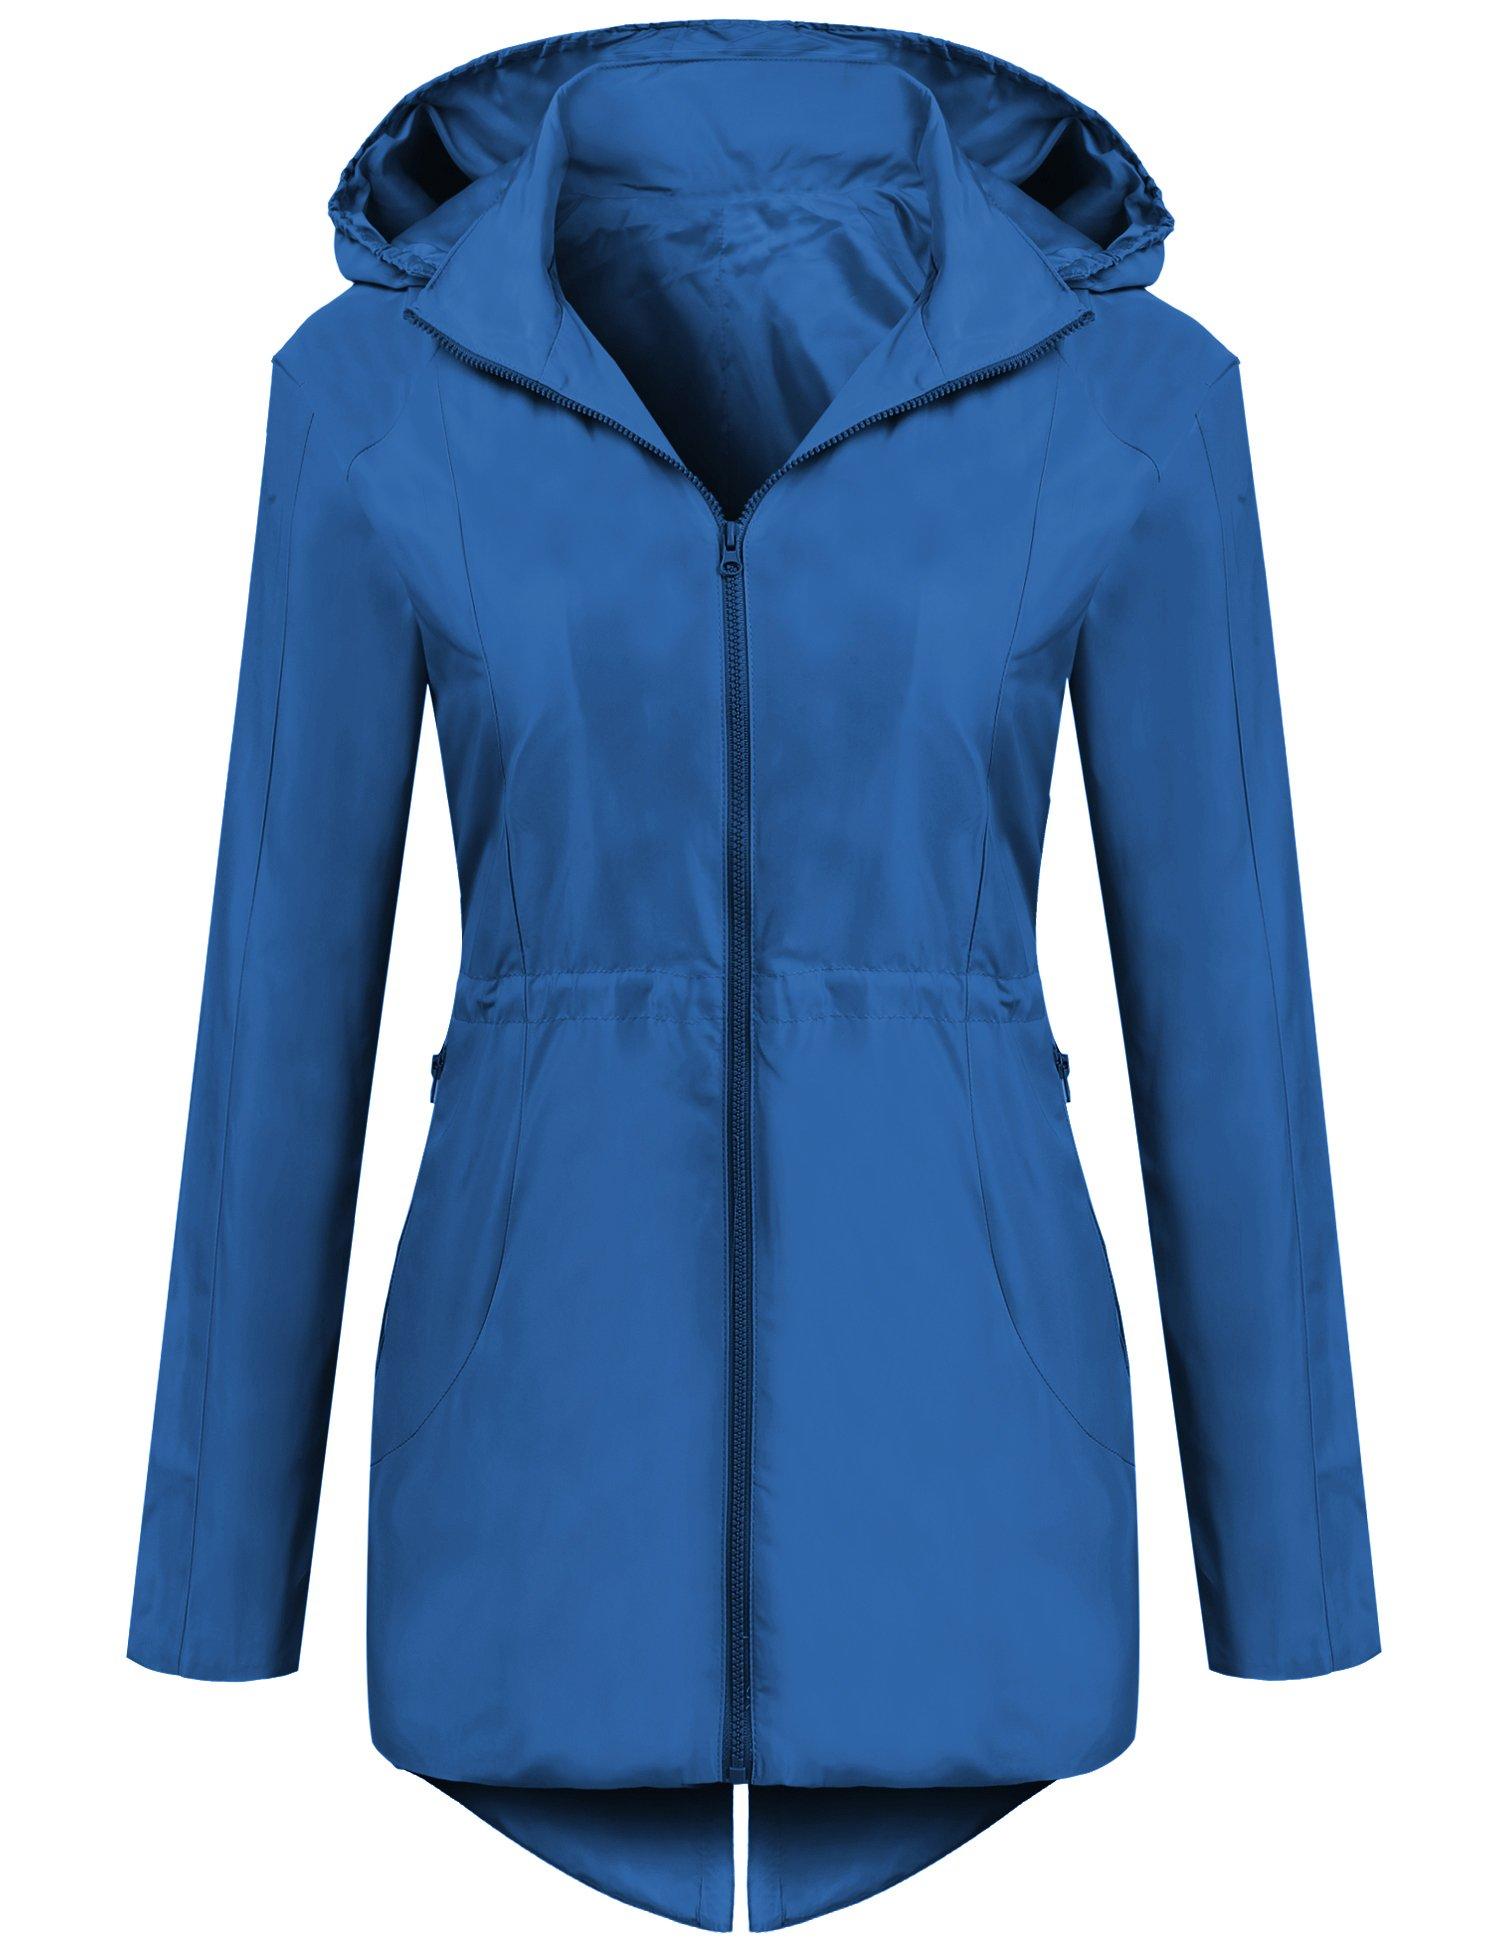 SummerRio Women's Lightweight Zip Up Travel Coat Hiking Coat Packable Jacket (Royal Blue)  XX_Large